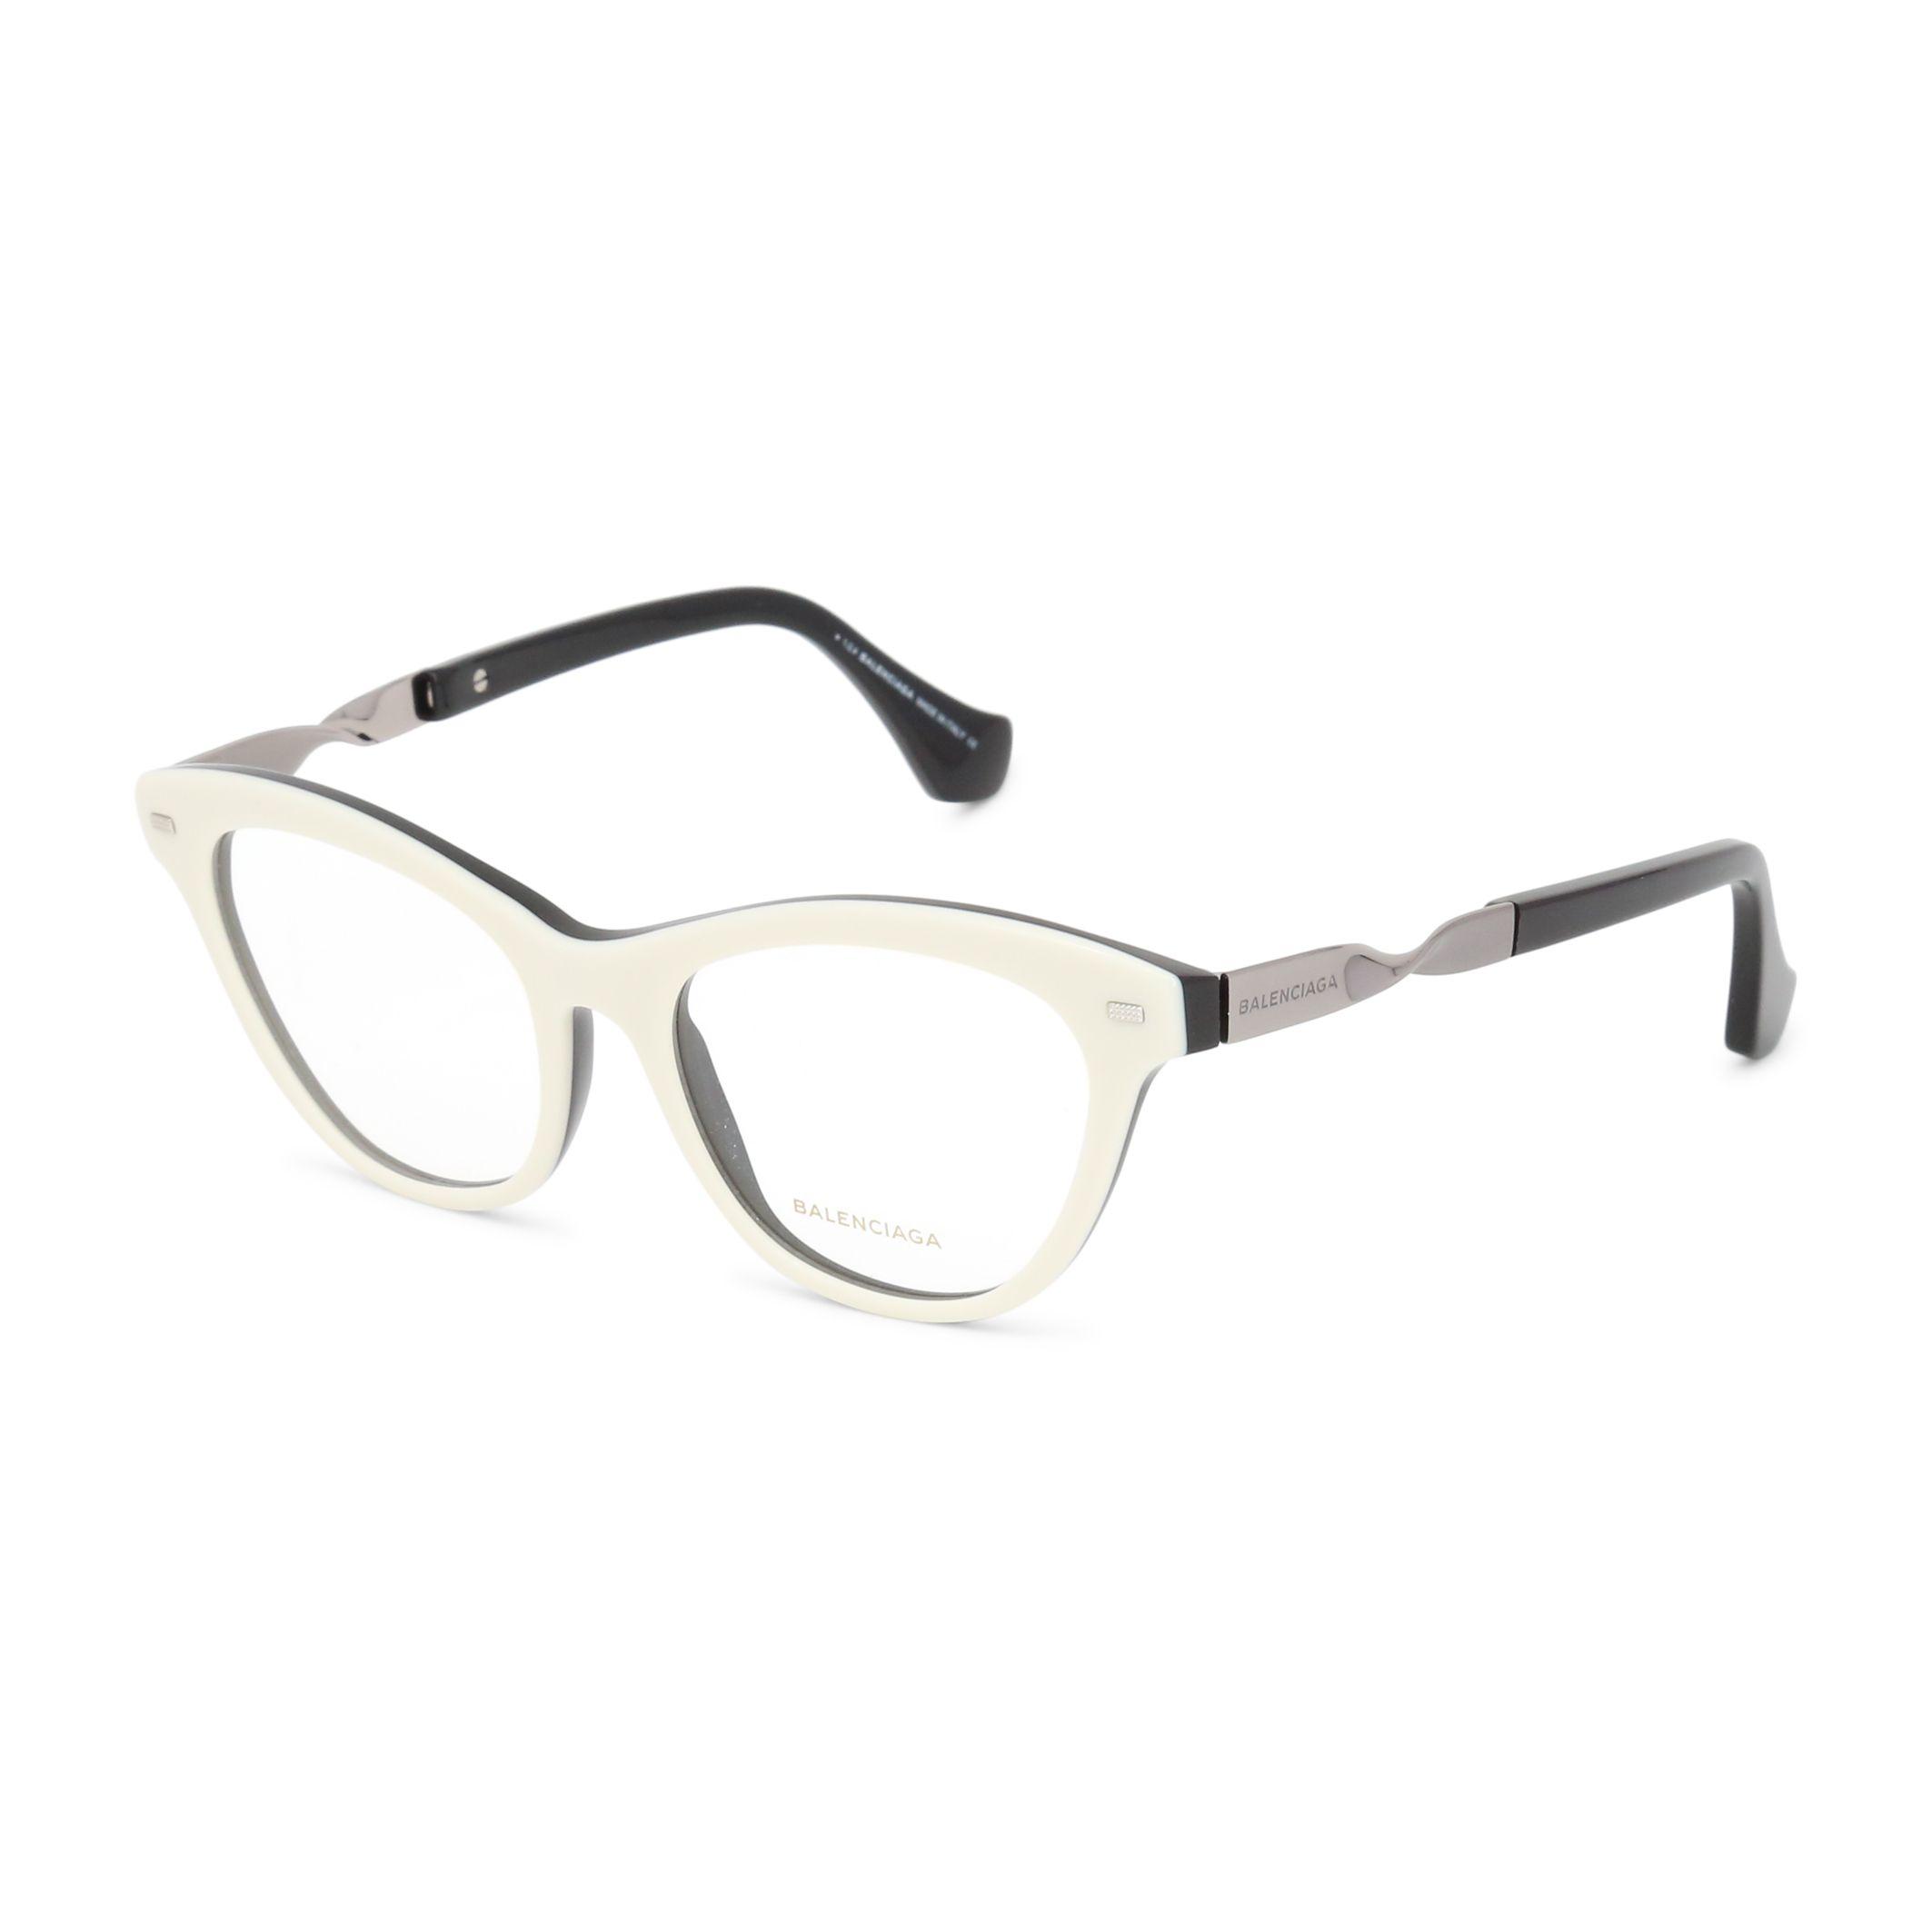 Balenciaga Womens Eyeglasses